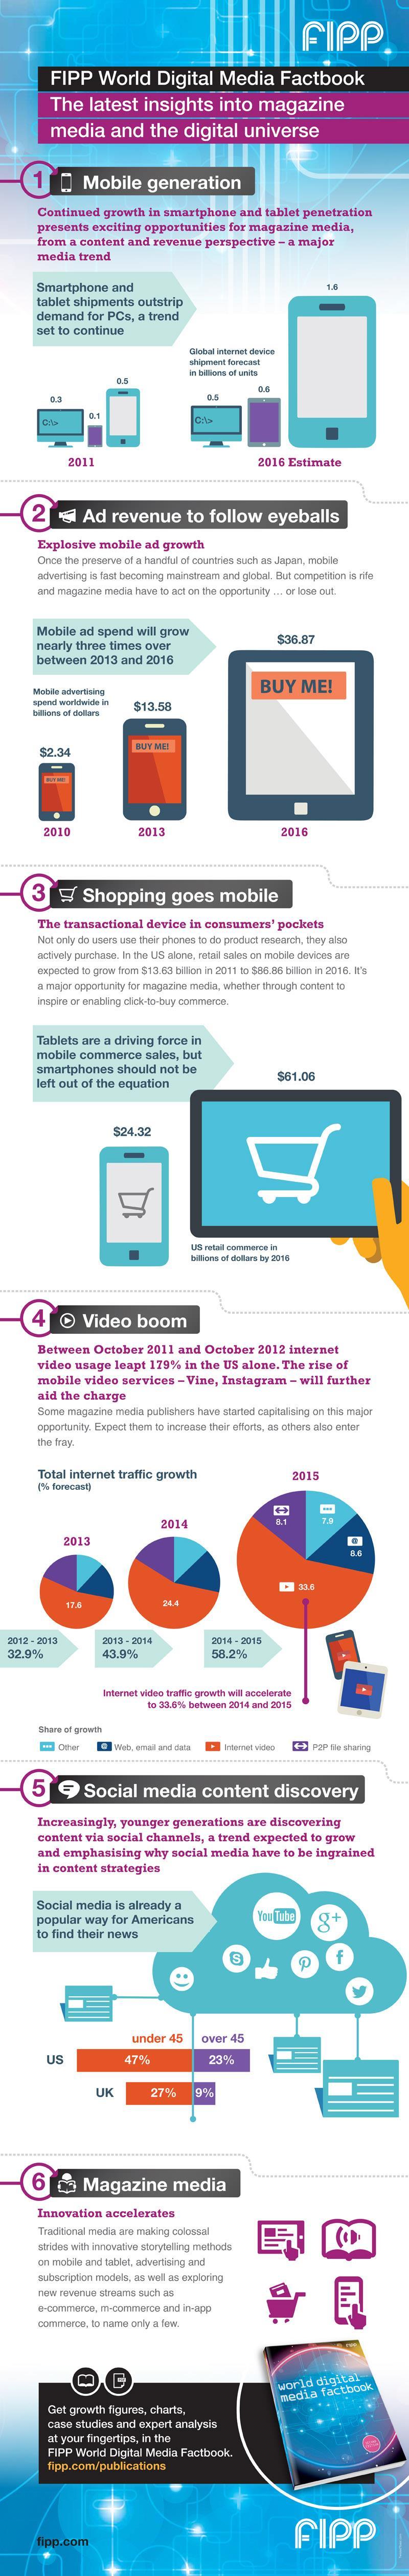 FIPP World Digital Media Factbook 2013-14 infographic